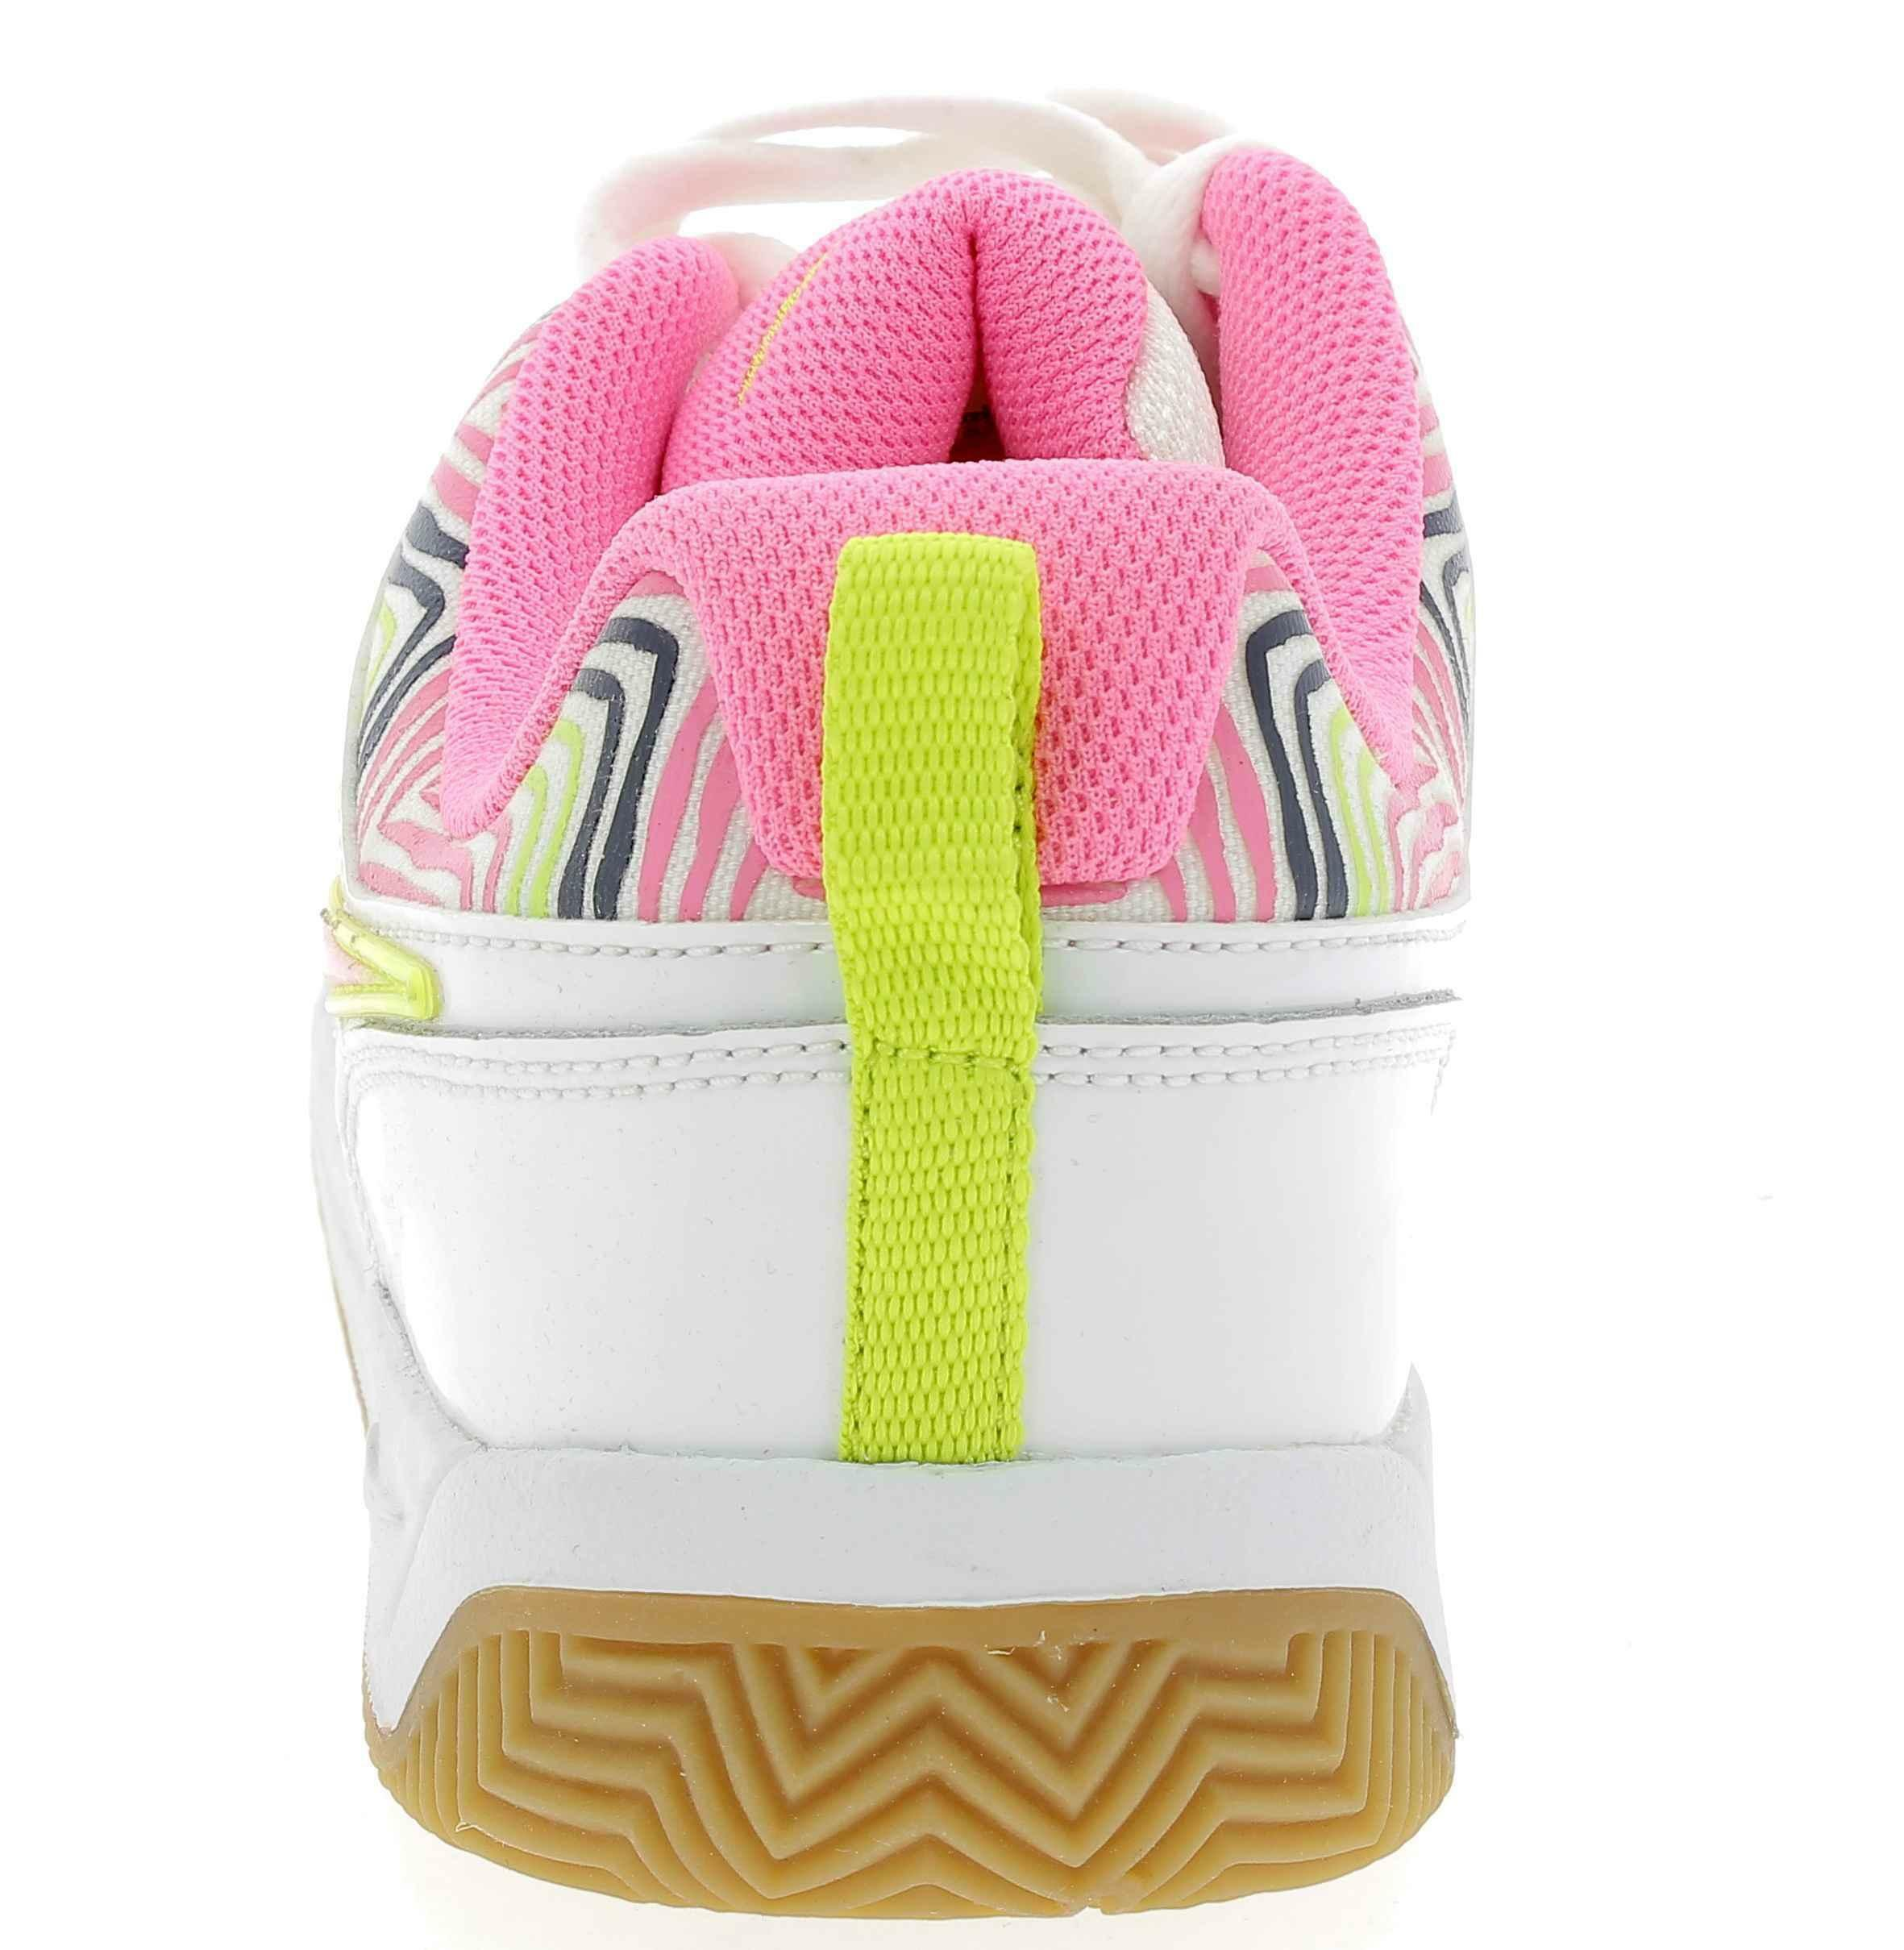 nike likin 11 scarpe sportive bambina pelle bianche